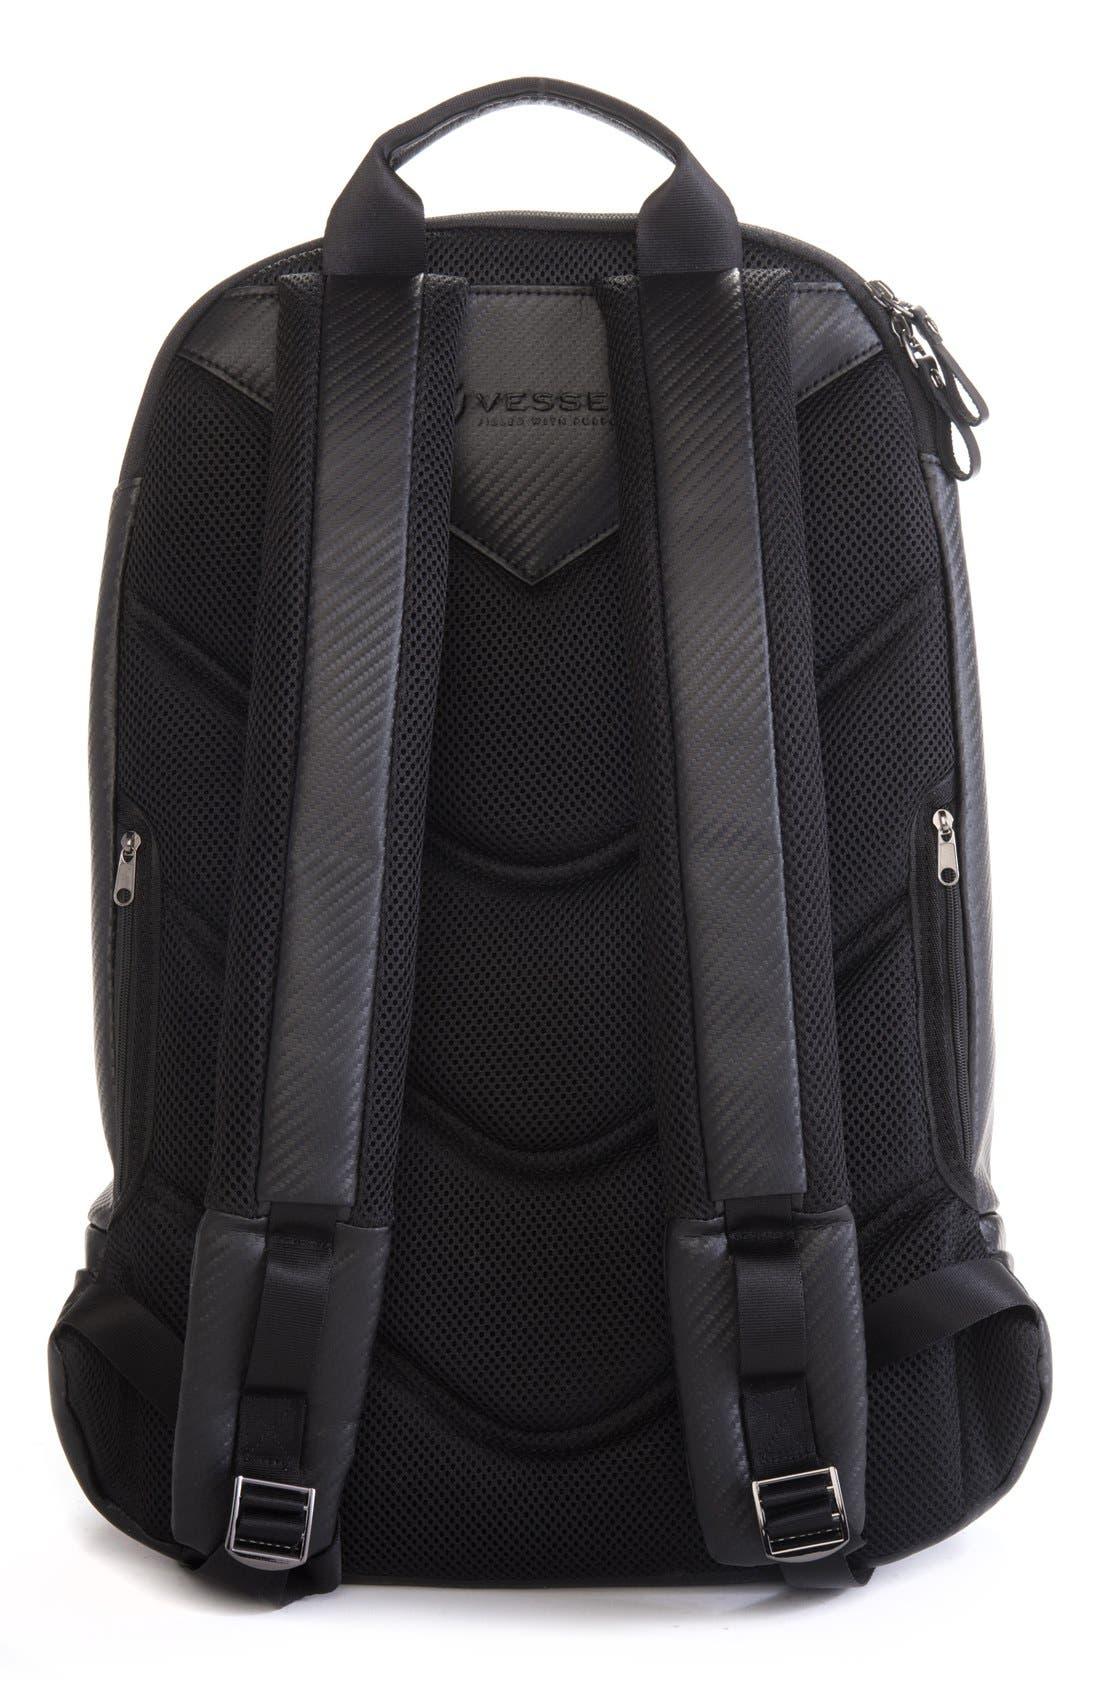 Alternate Image 3  - Vessel 'Signature' Backpack